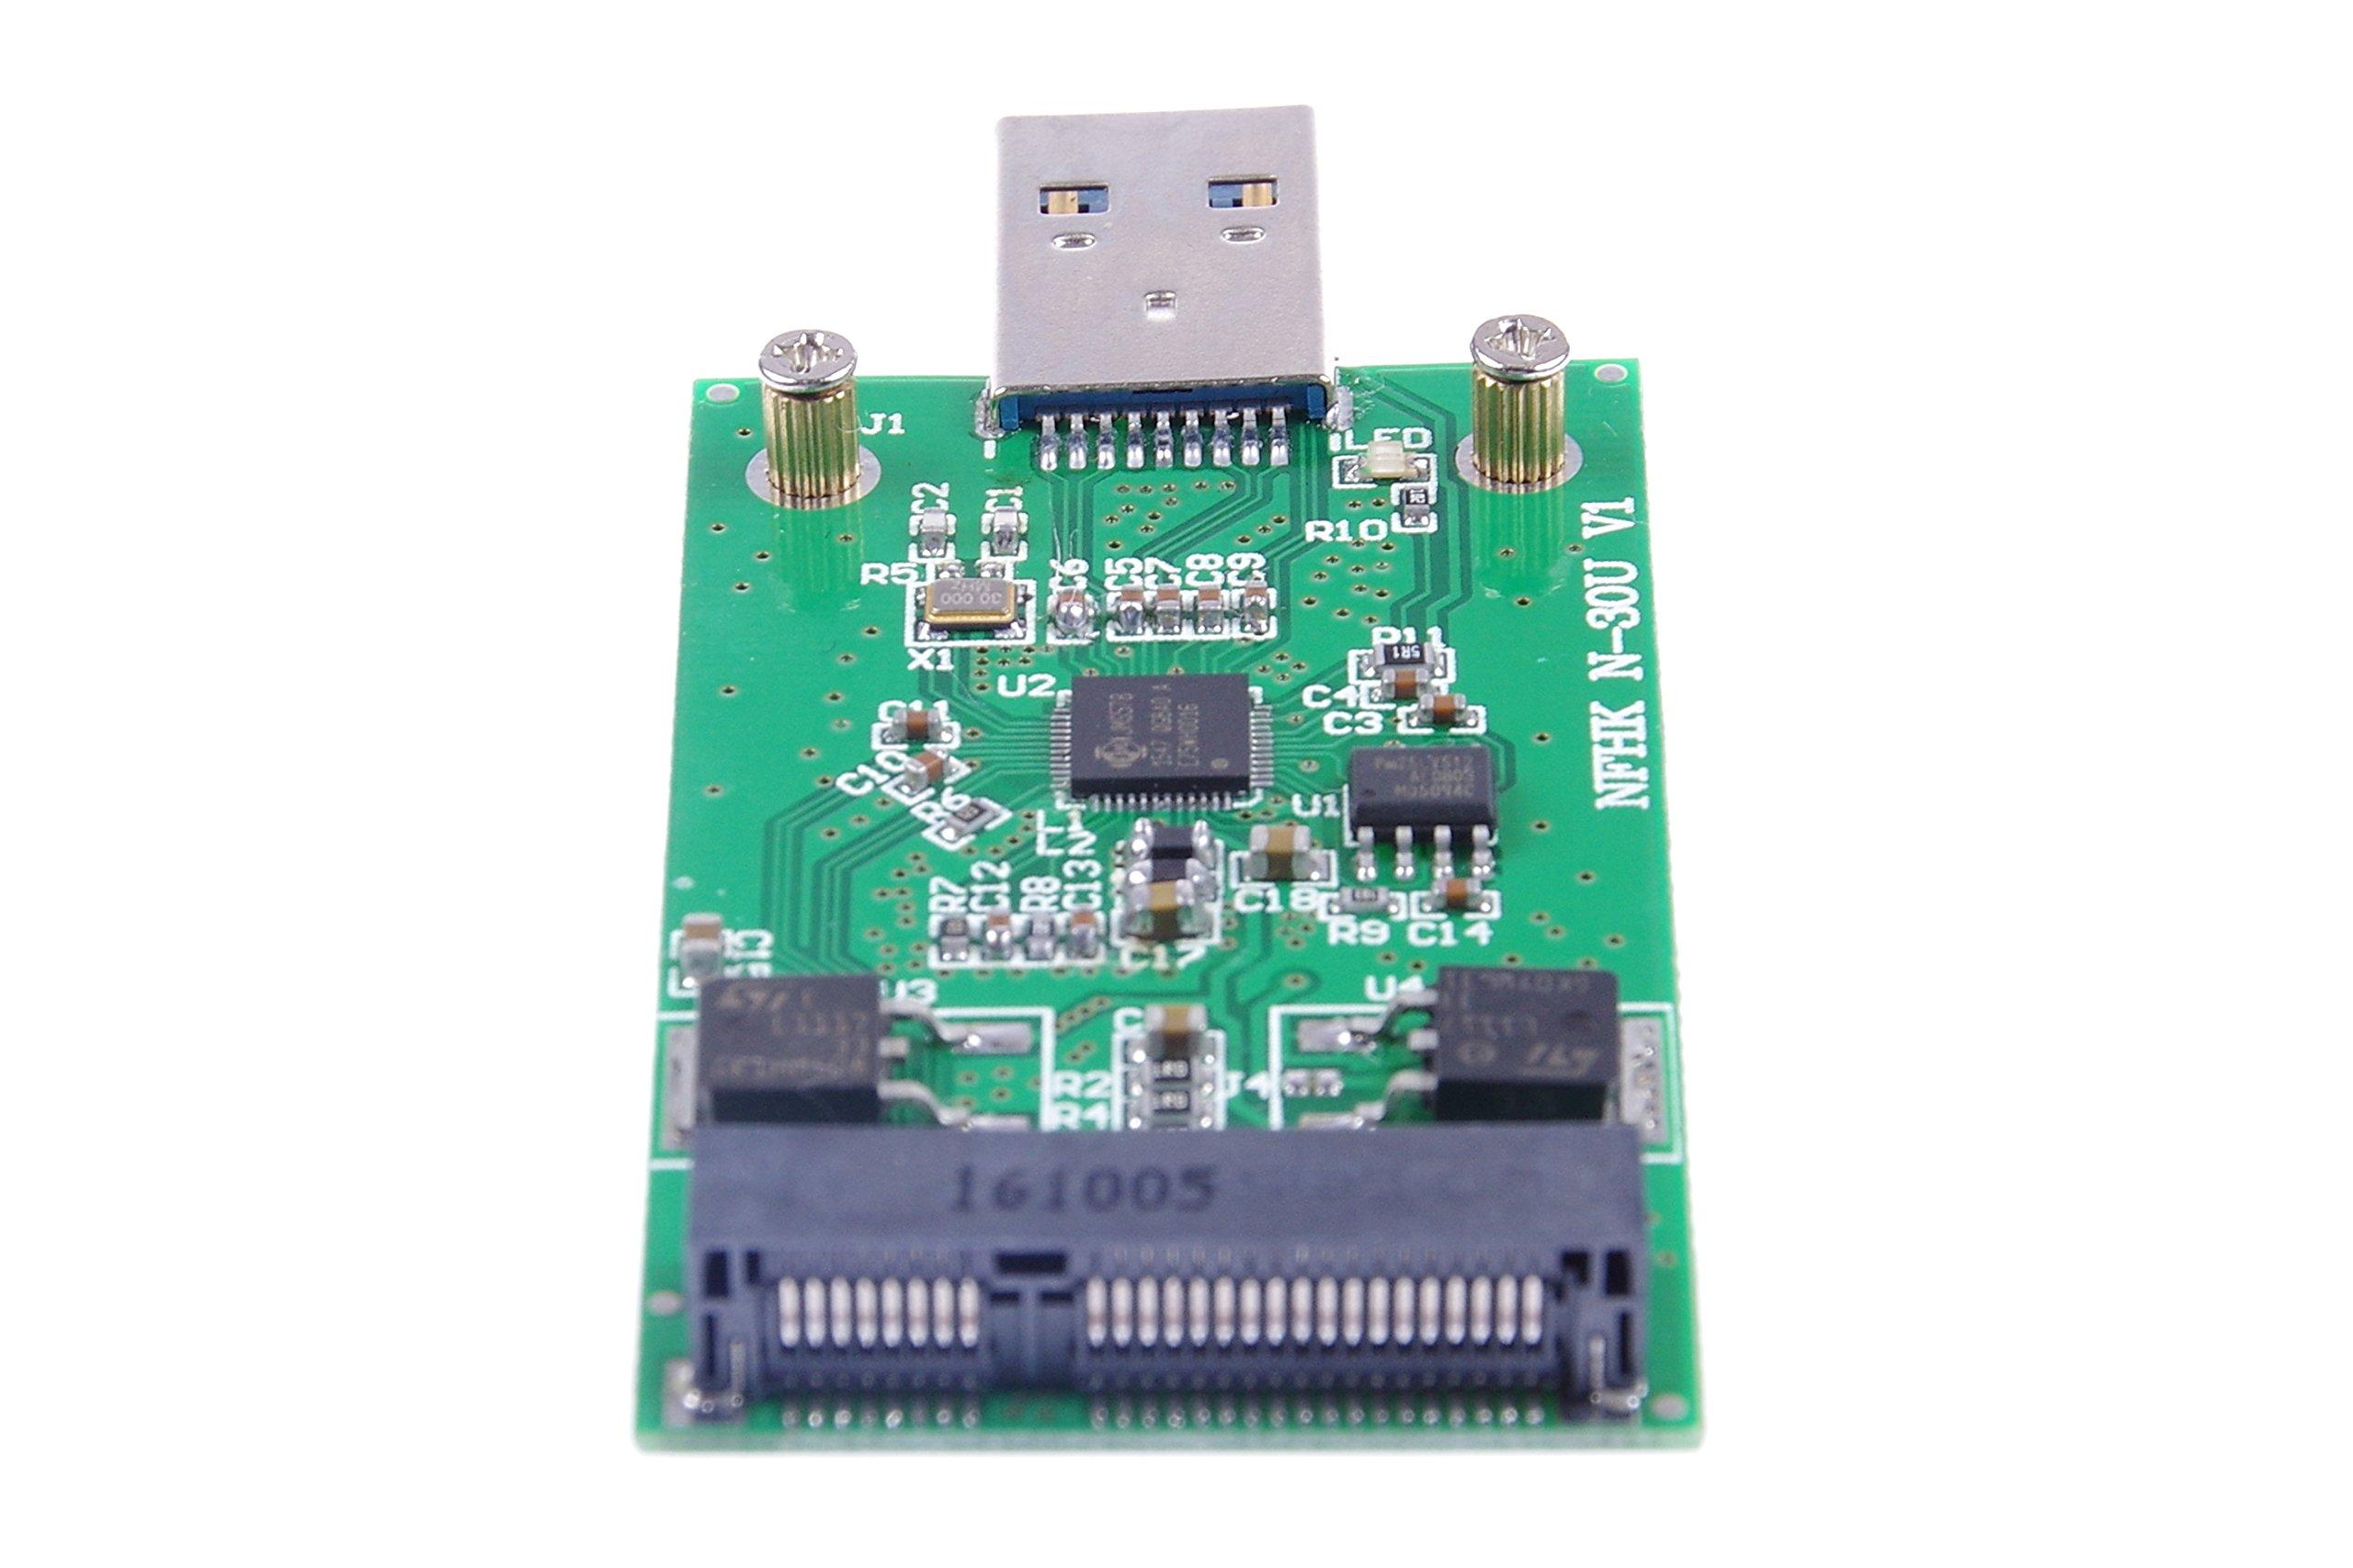 KNACRO USB 3.0 mSATA SSD Adapter as USB Disk Driver don't need USB cable USB 3.0 to mSATA SSD adapter card by KNACRO (Image #4)